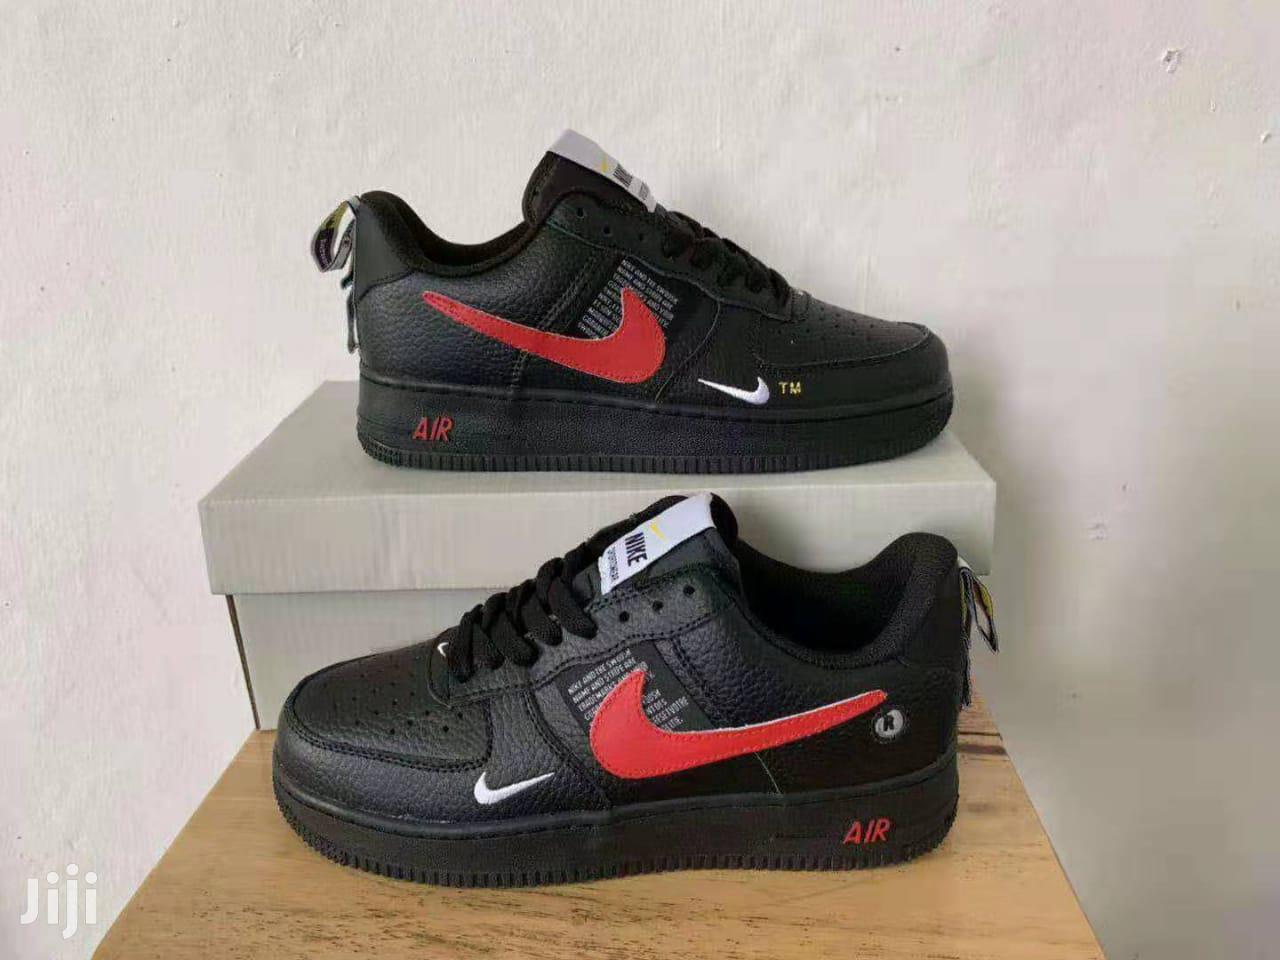 Unisex Casual Nike Airforce TM Sneakers | Shoes for sale in Nairobi Central, Nairobi, Kenya